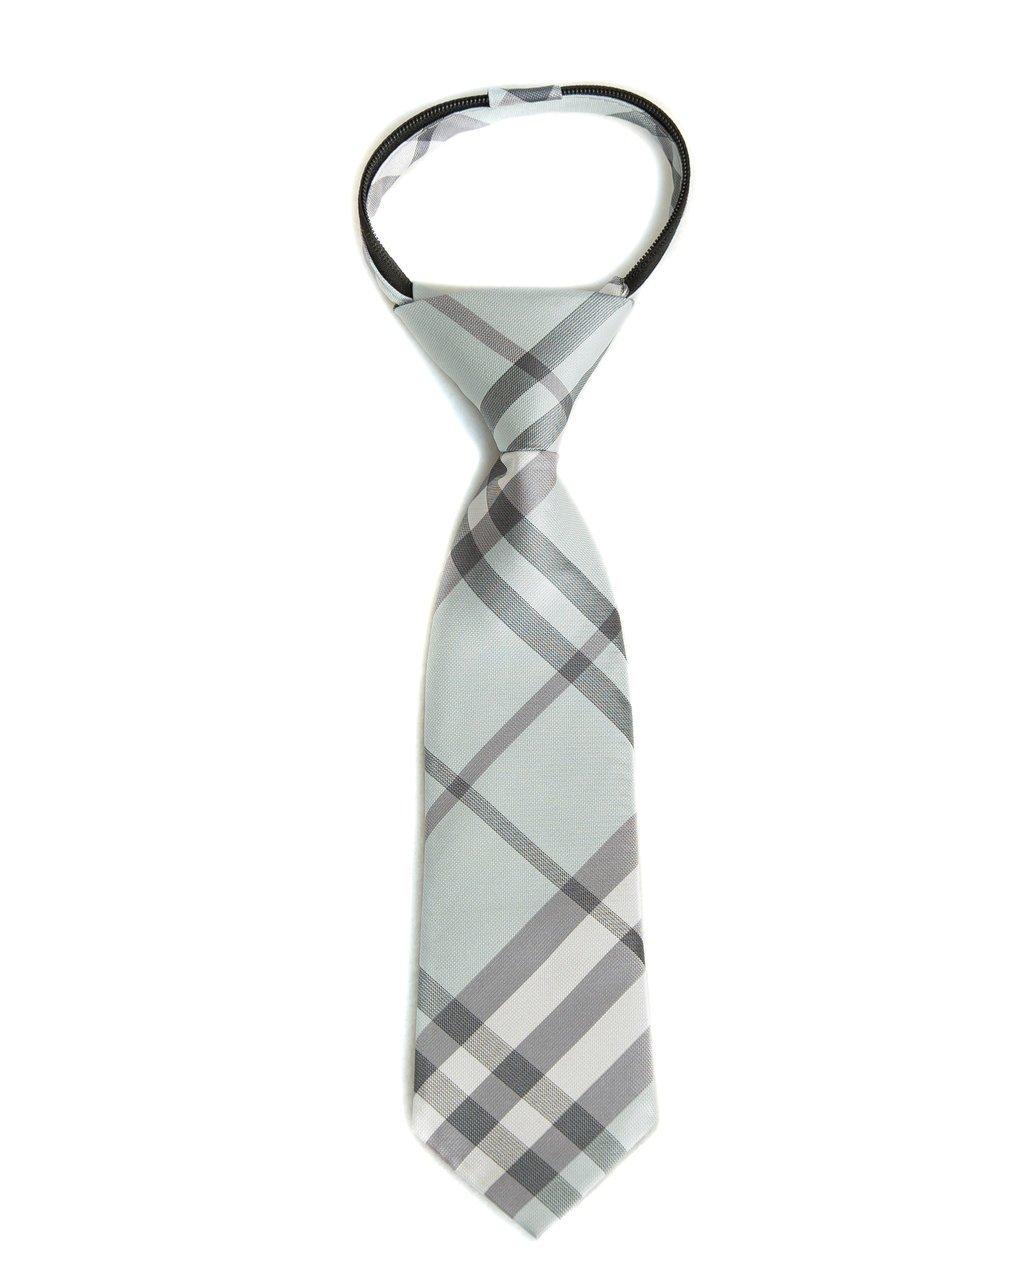 Ice & Ash Plaid Zipper Tie (Boys and Men).